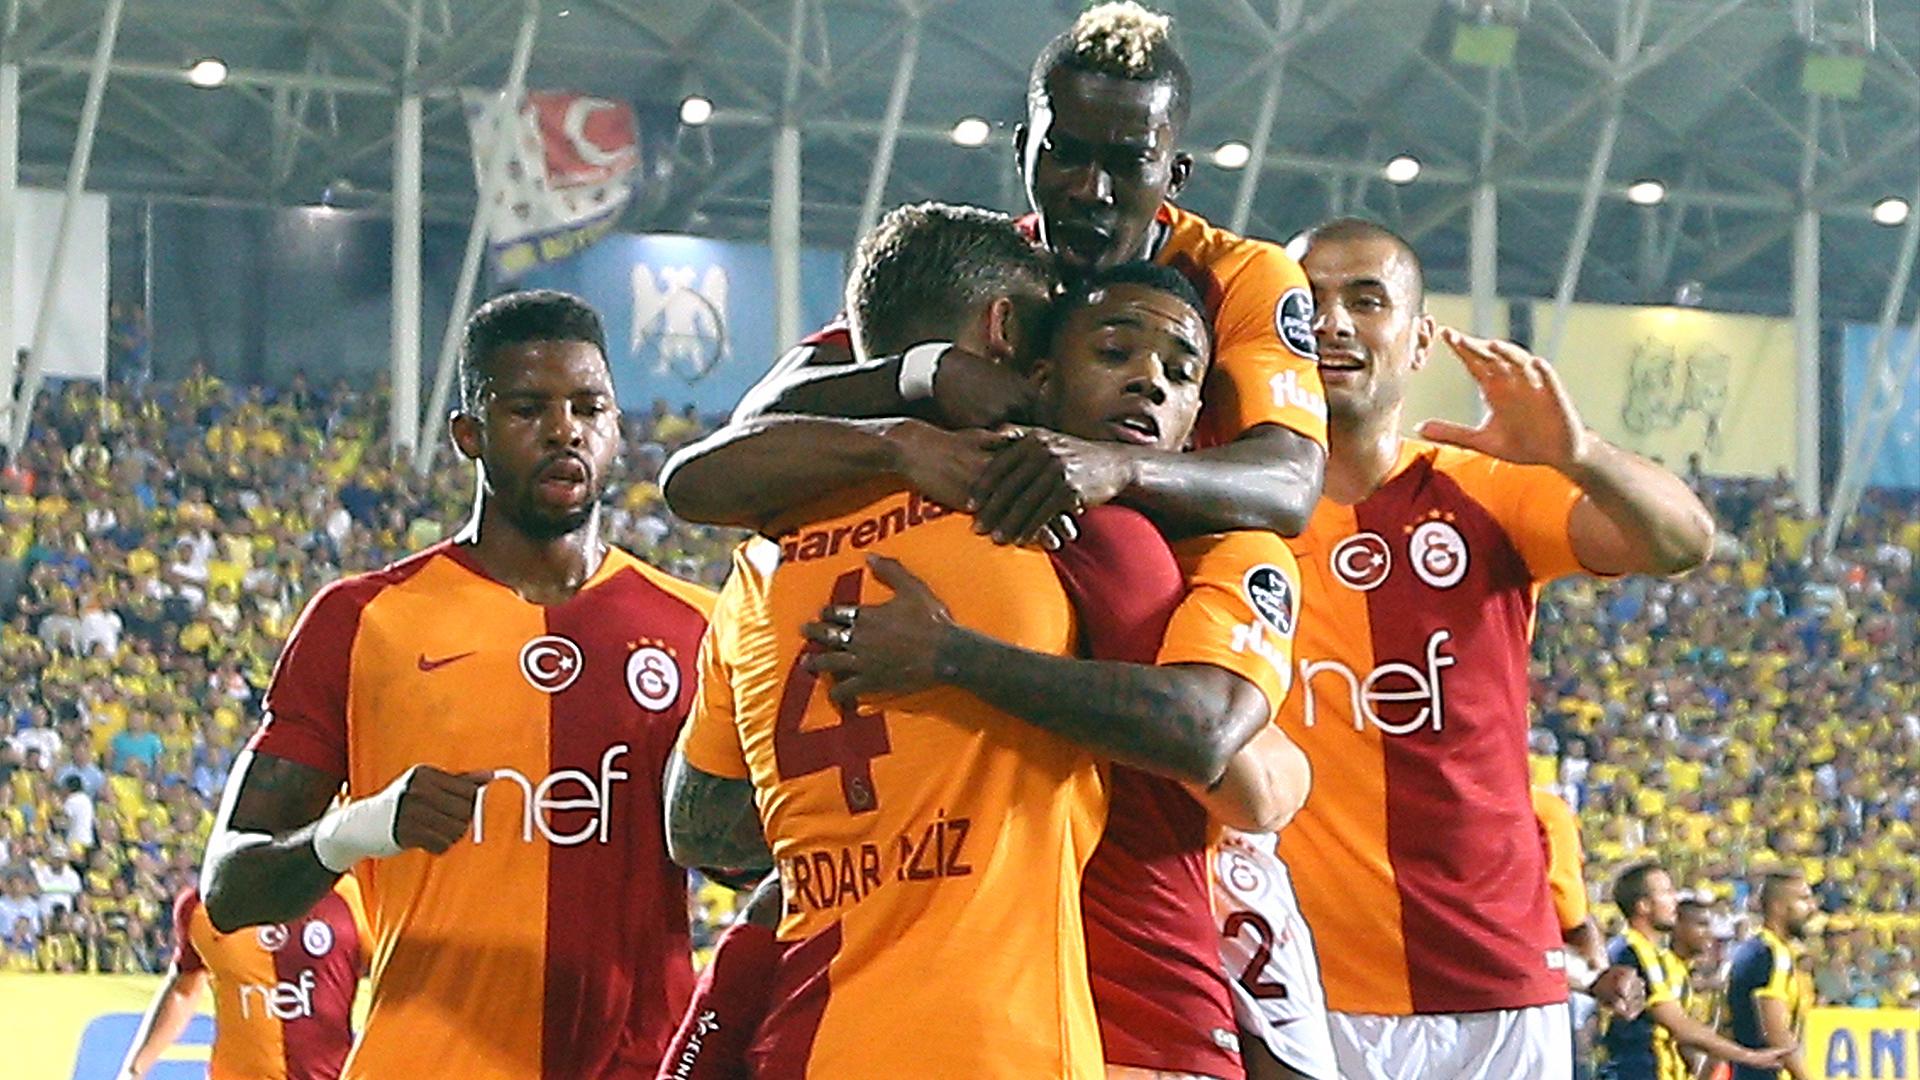 Ankaragucu Galatasaray goal celebration 08102018